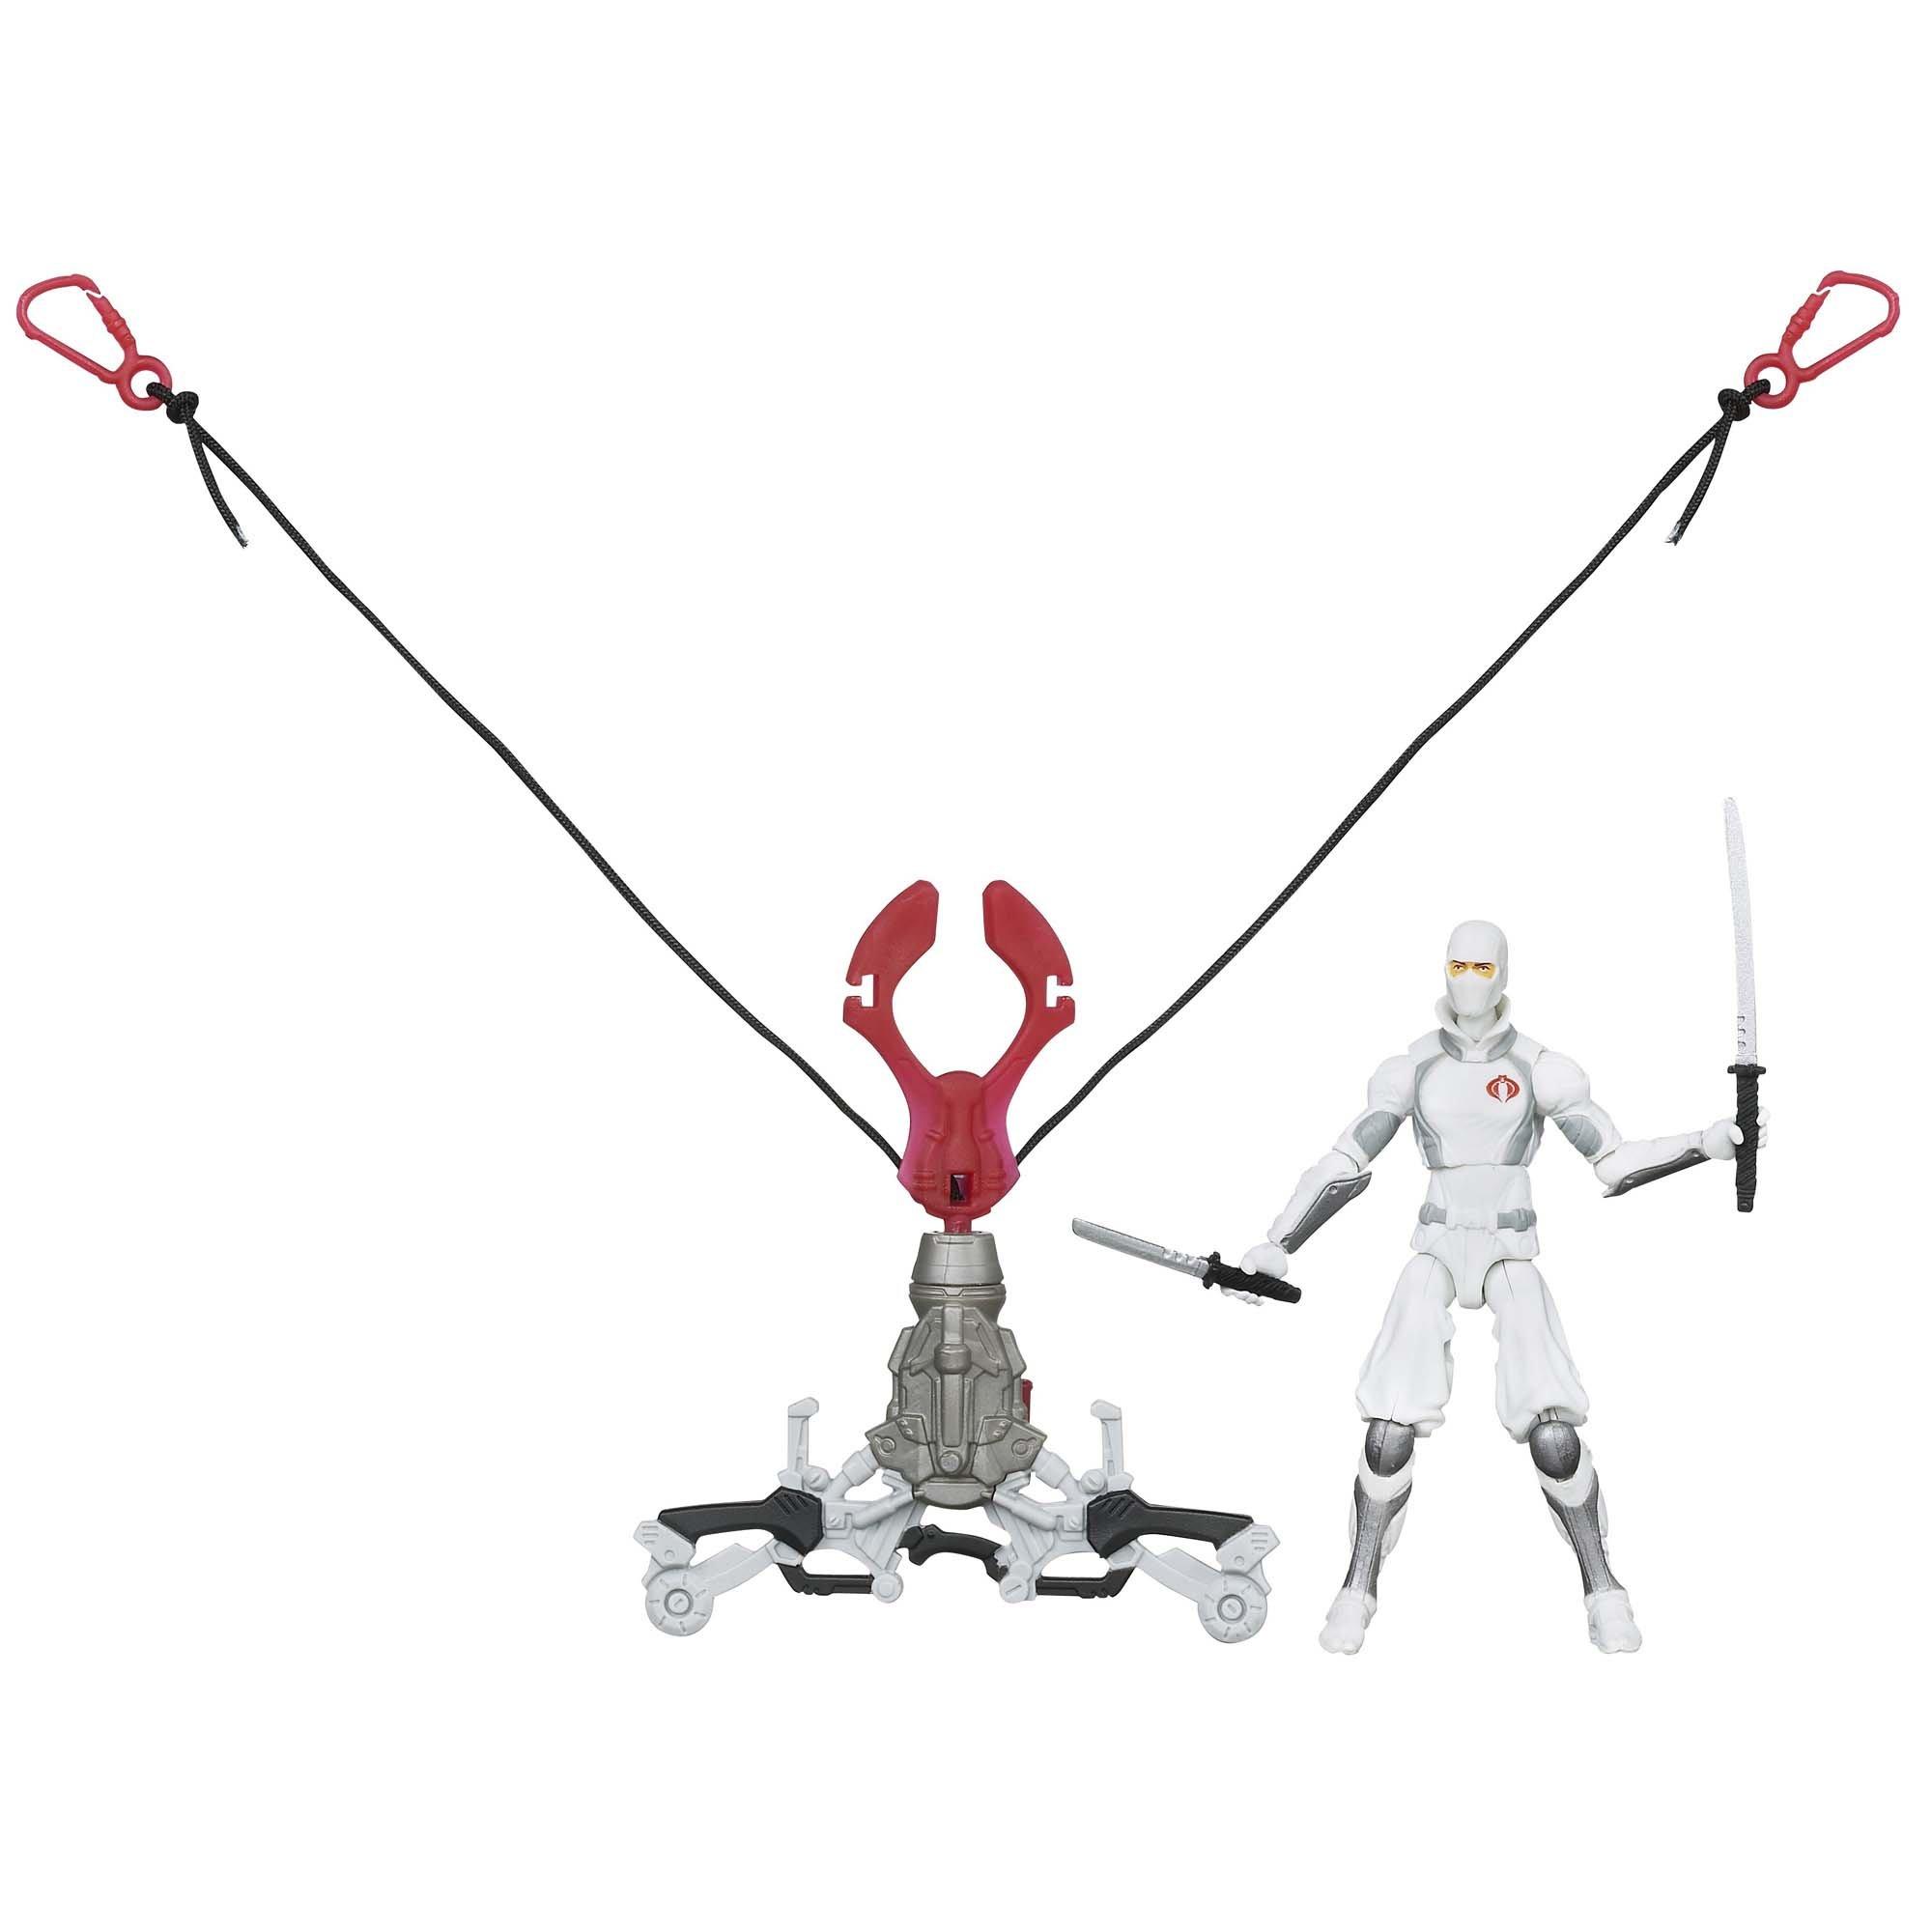 G.I. Joe Retaliation Storm Shadow Action Figure